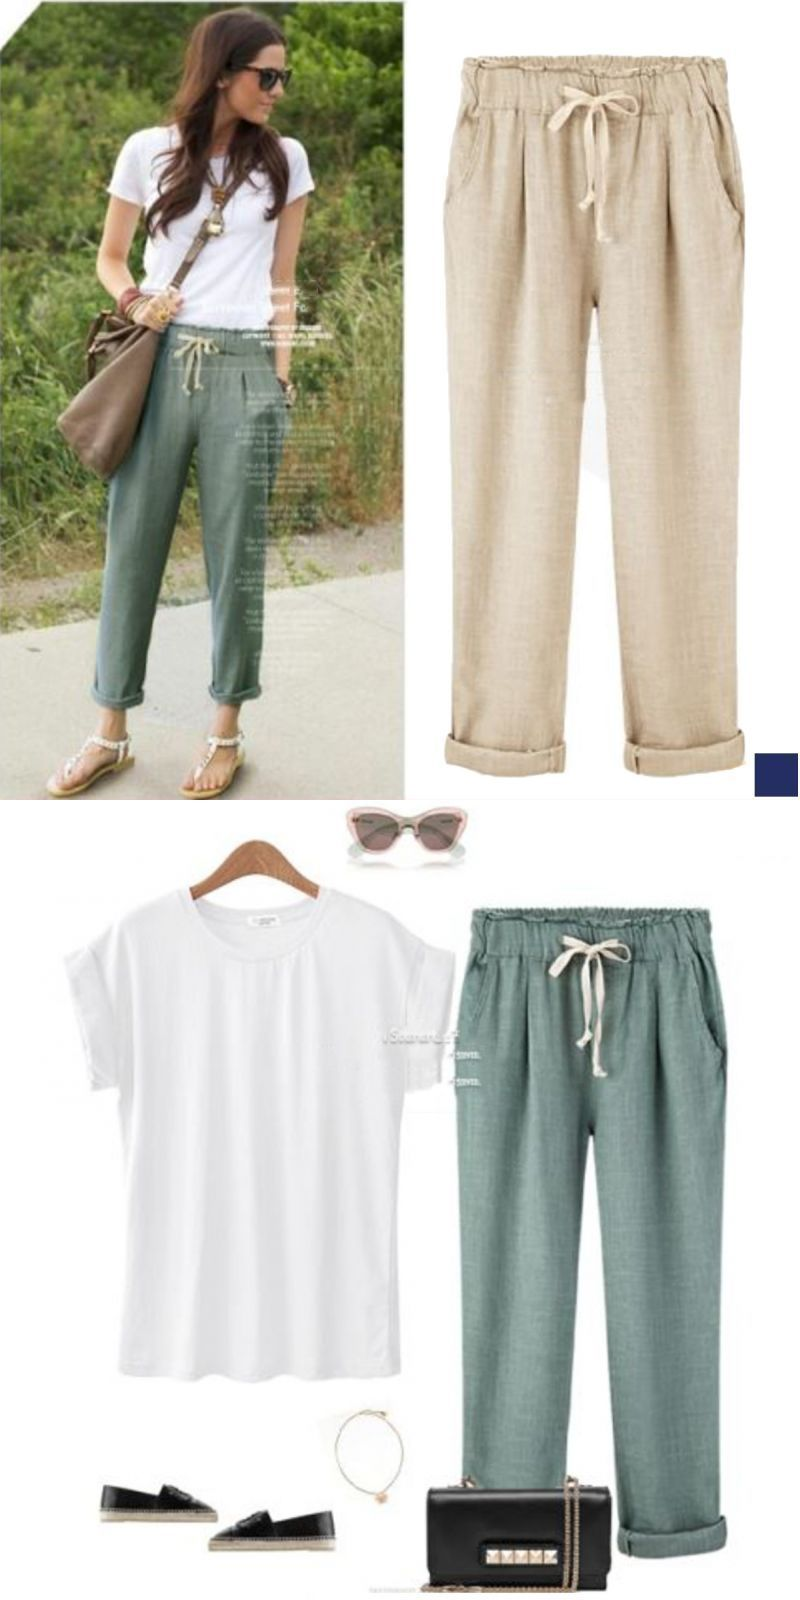 ca56f5097bdb Elastic waist breathable cotton pants in 3 colors yoga capris for ...